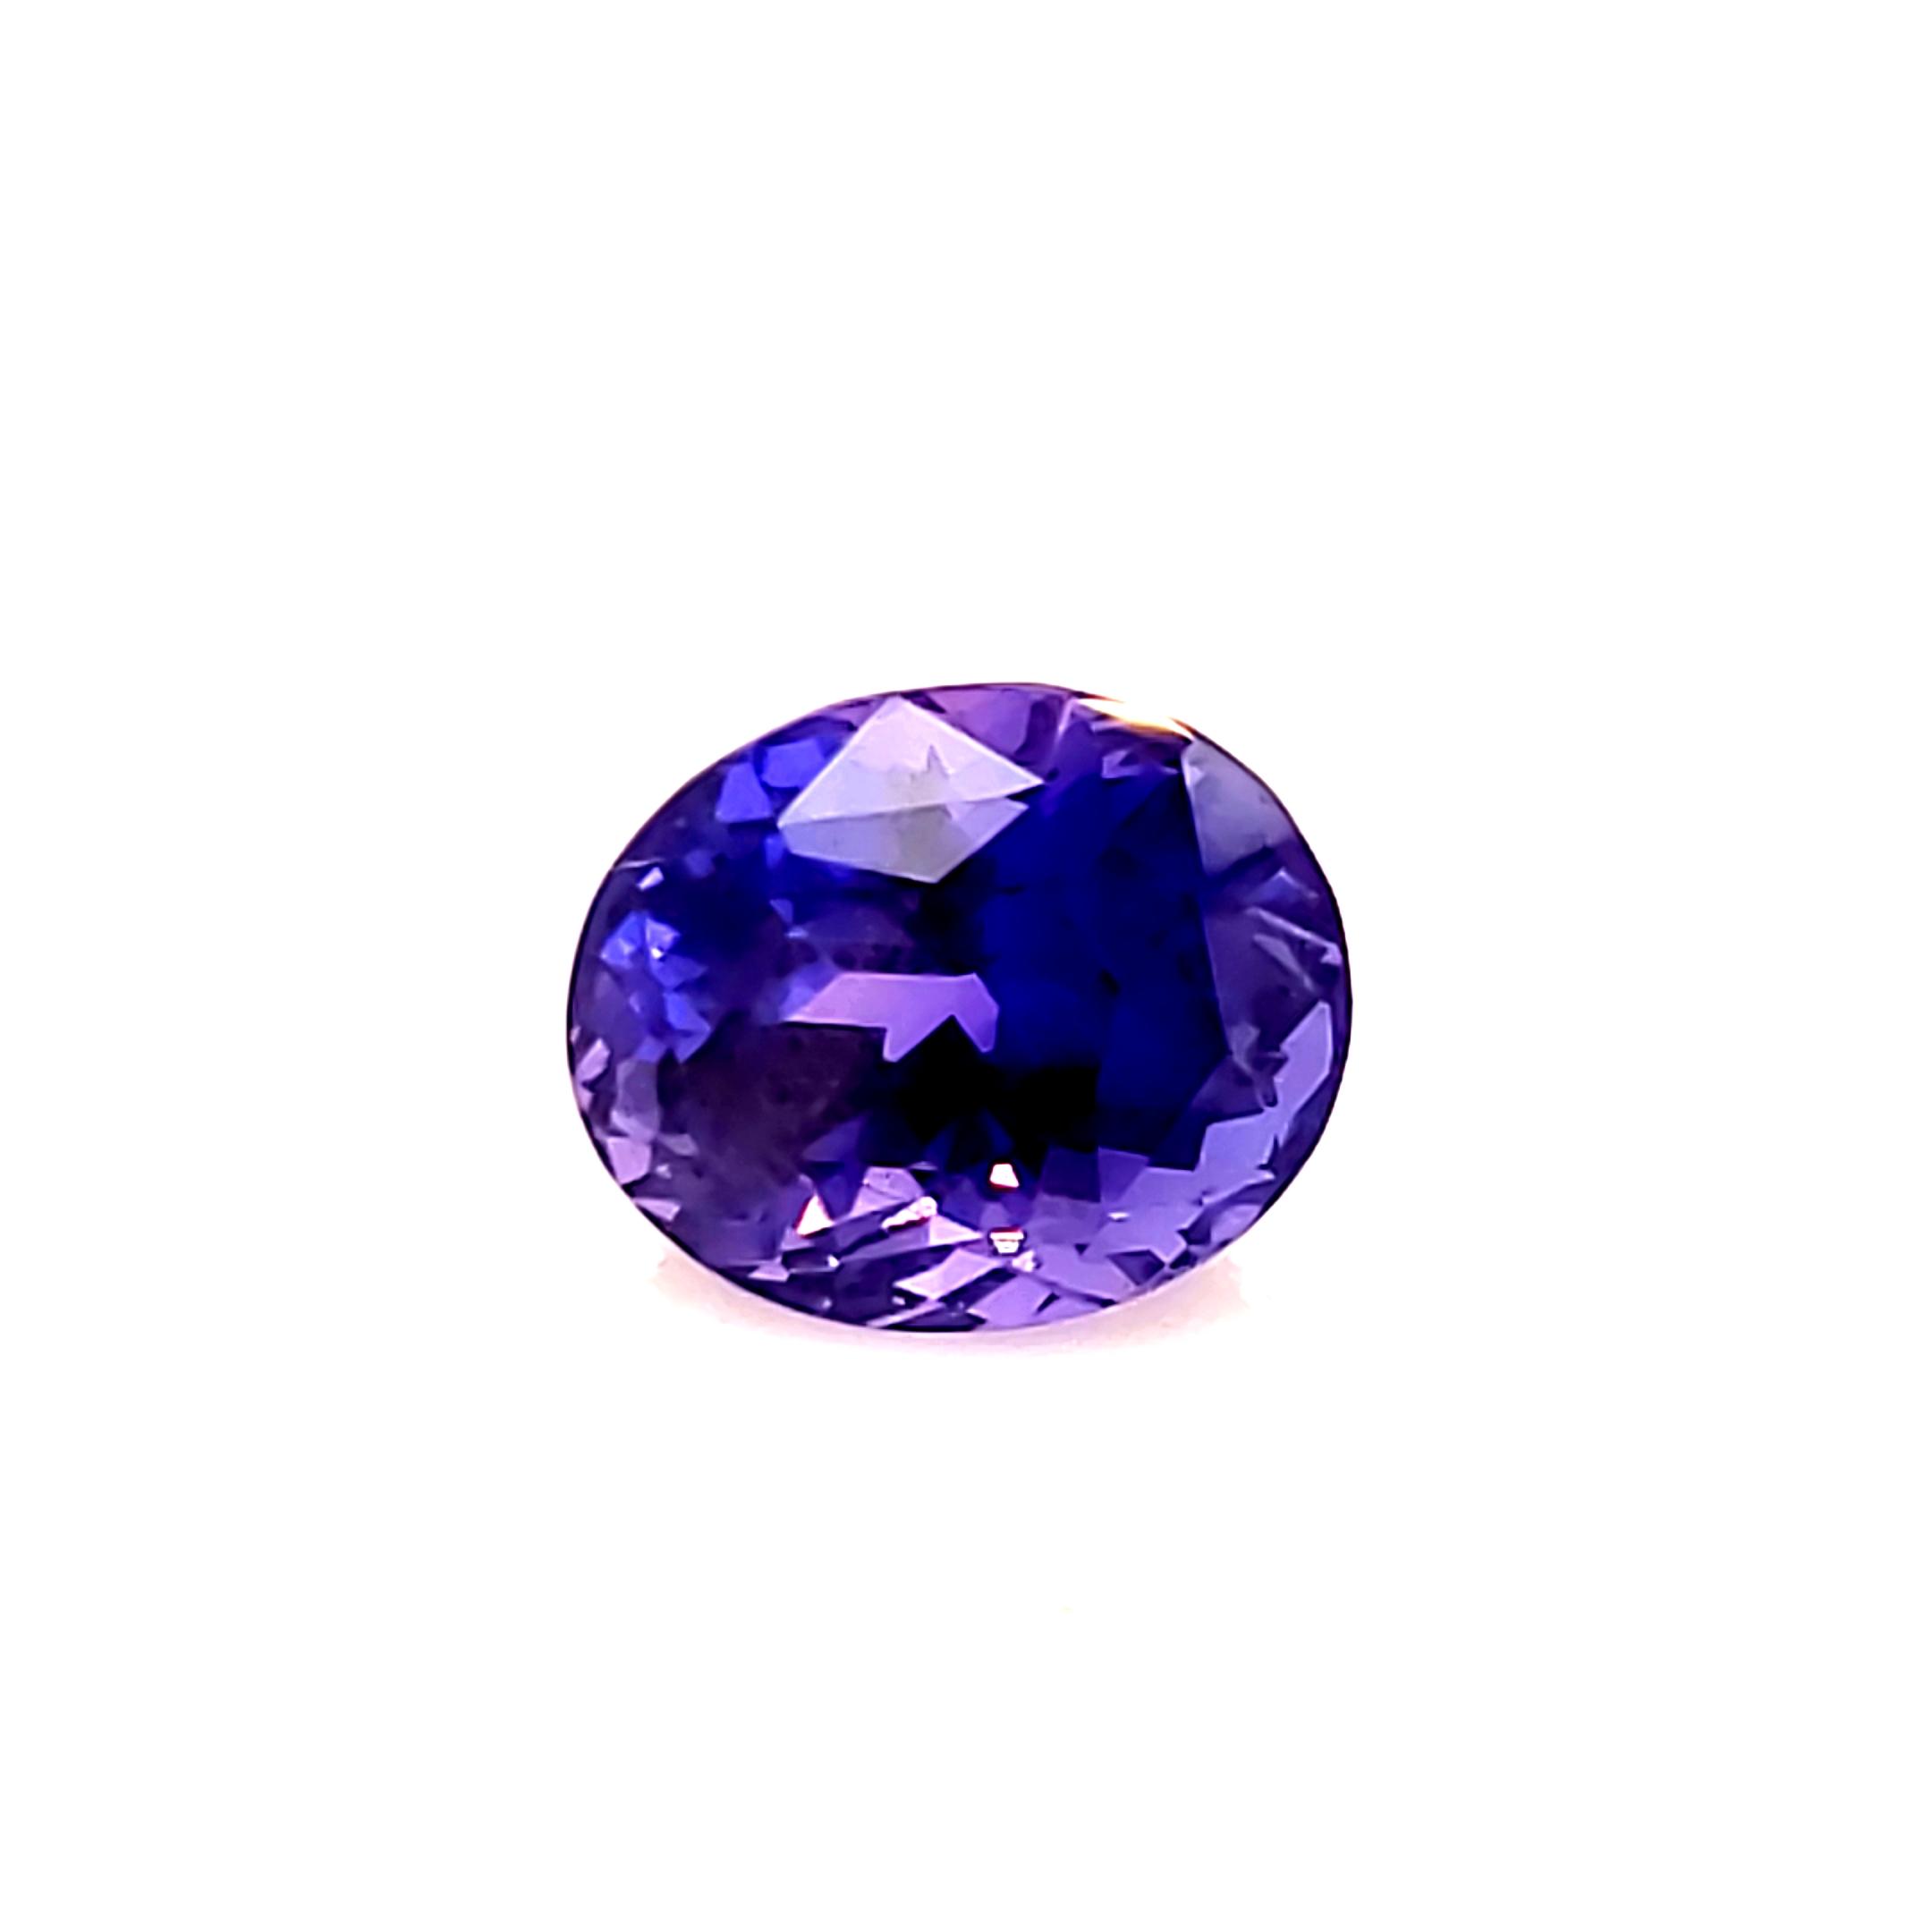 1.65 ct. Color Change Sapphire